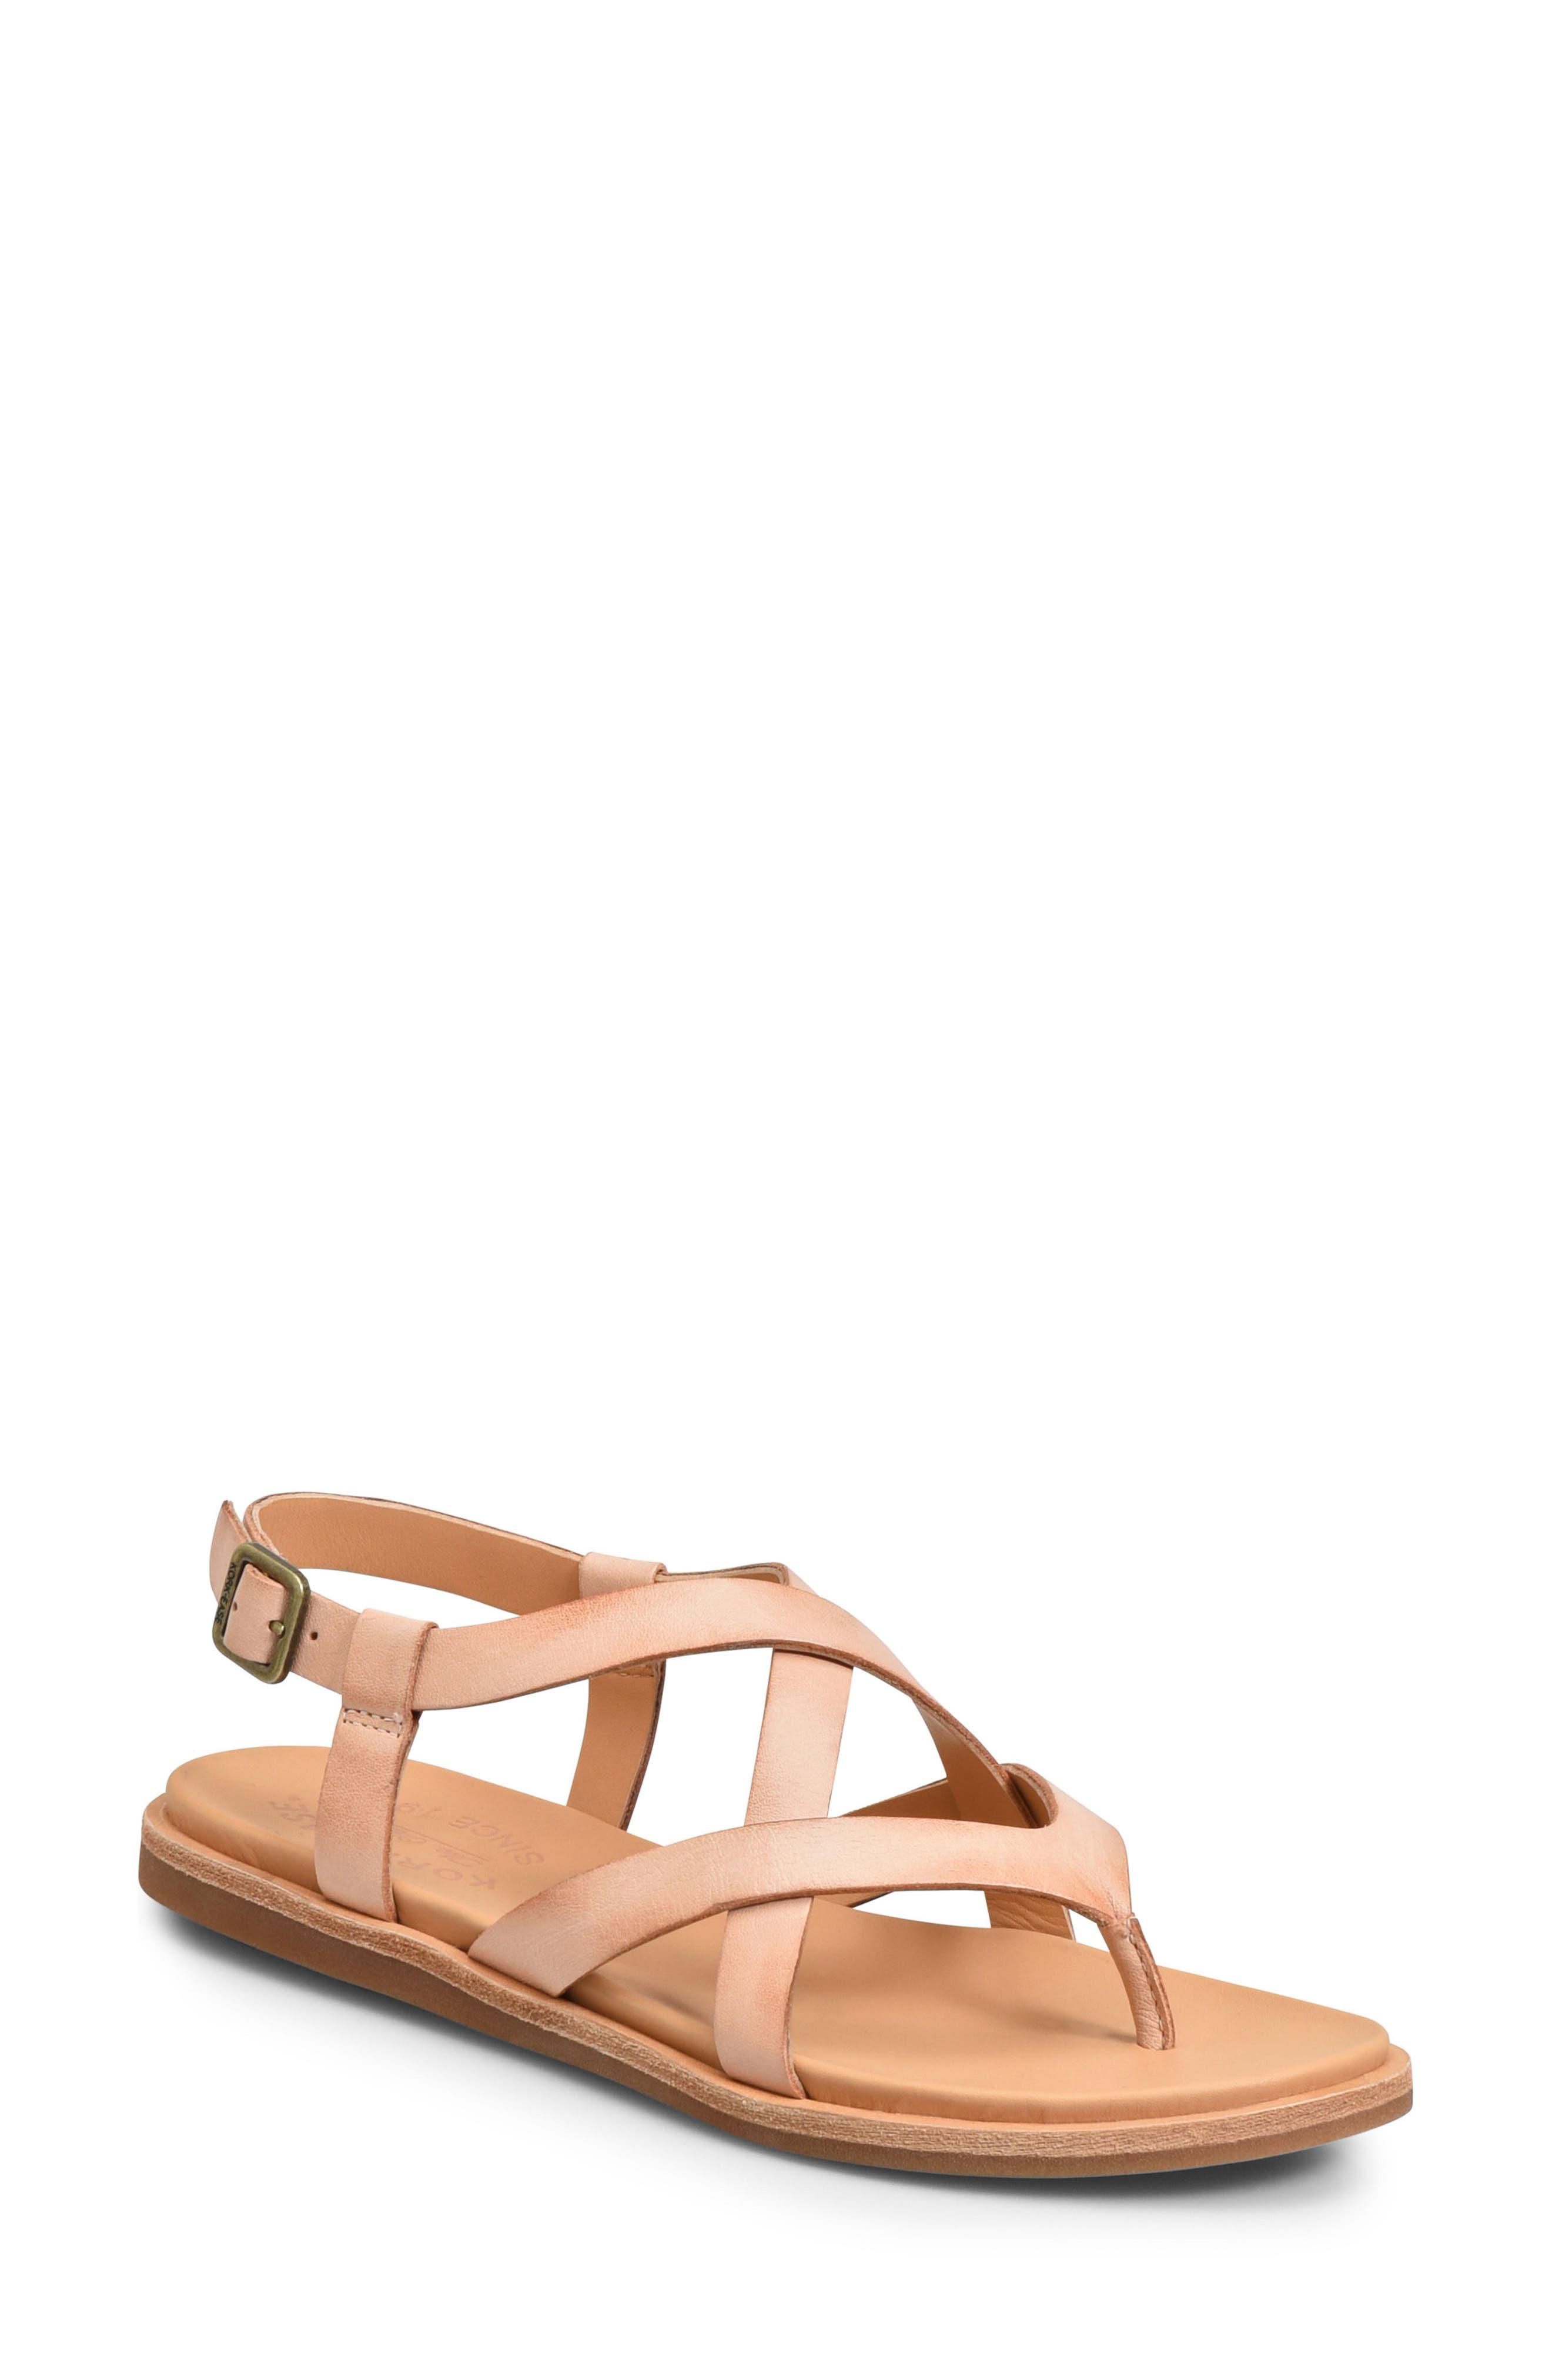 Kork-Ease Yarbrough Sandal, Pink